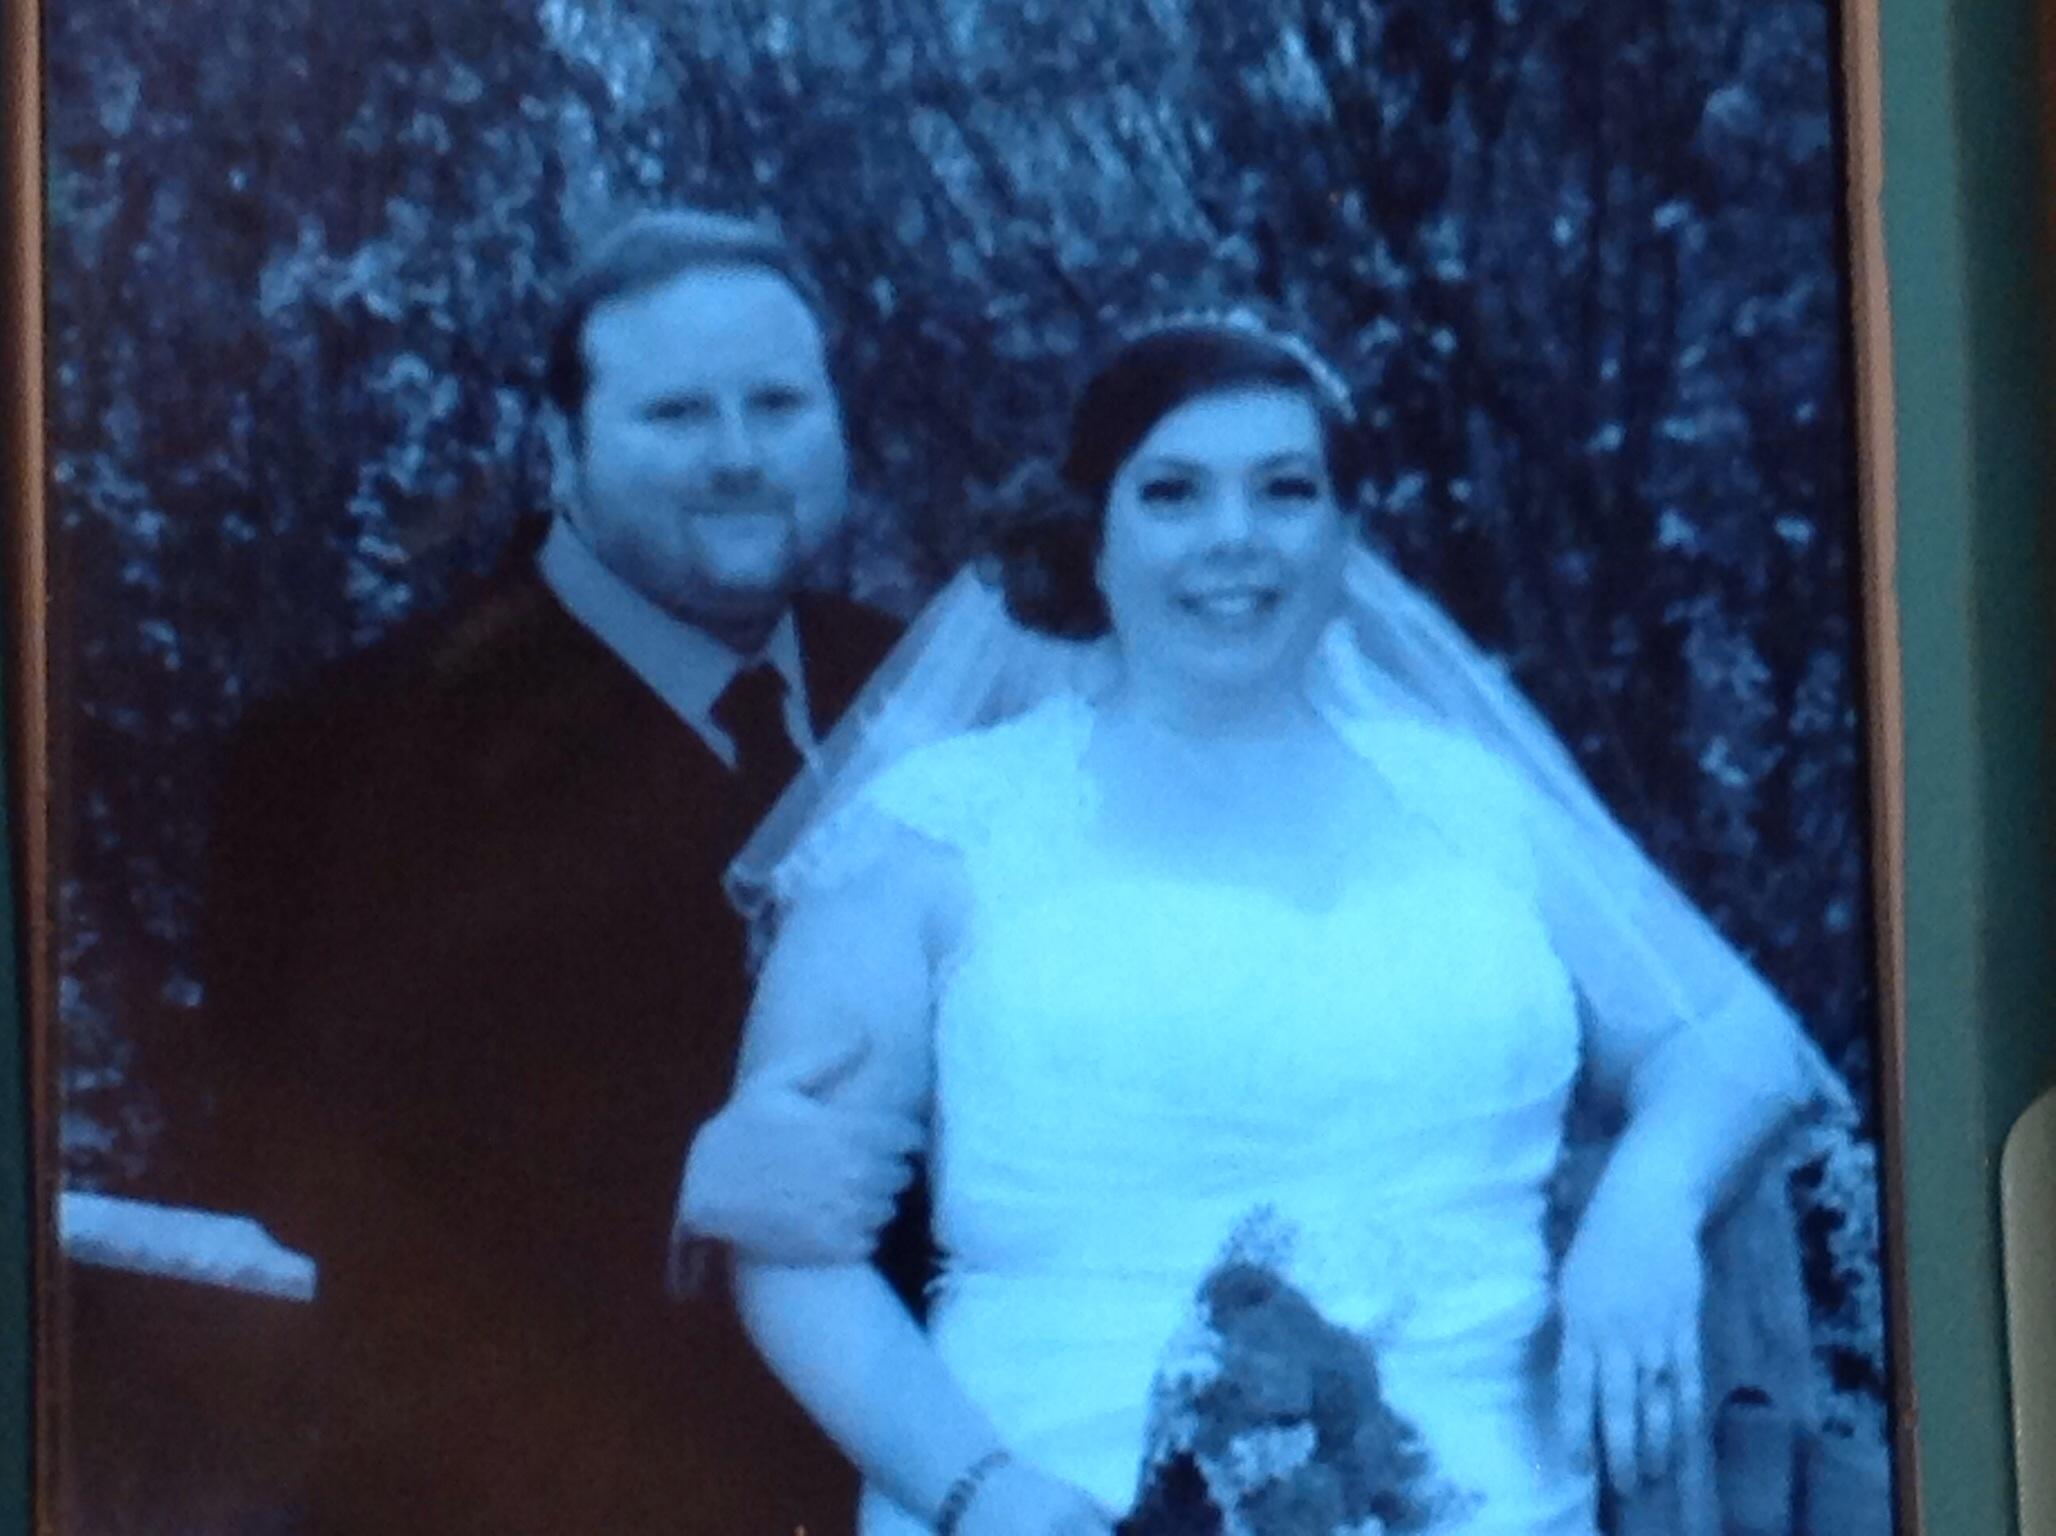 Megan Cathleen Croyle and Christopher Ryan House